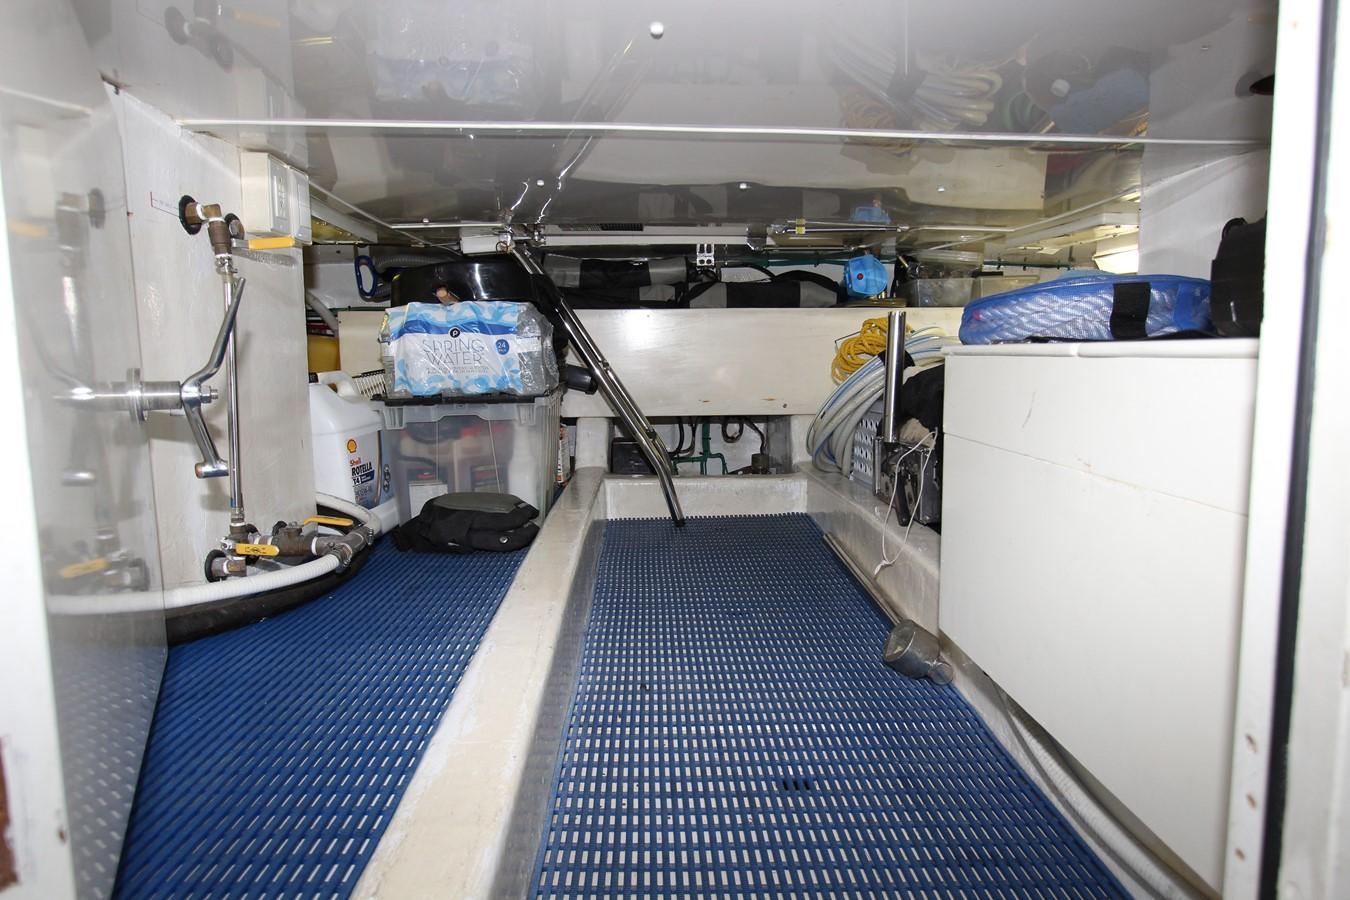 Lazarette 2006 OCEAN ALEXANDER Classicco Sedan Trawler 2561738